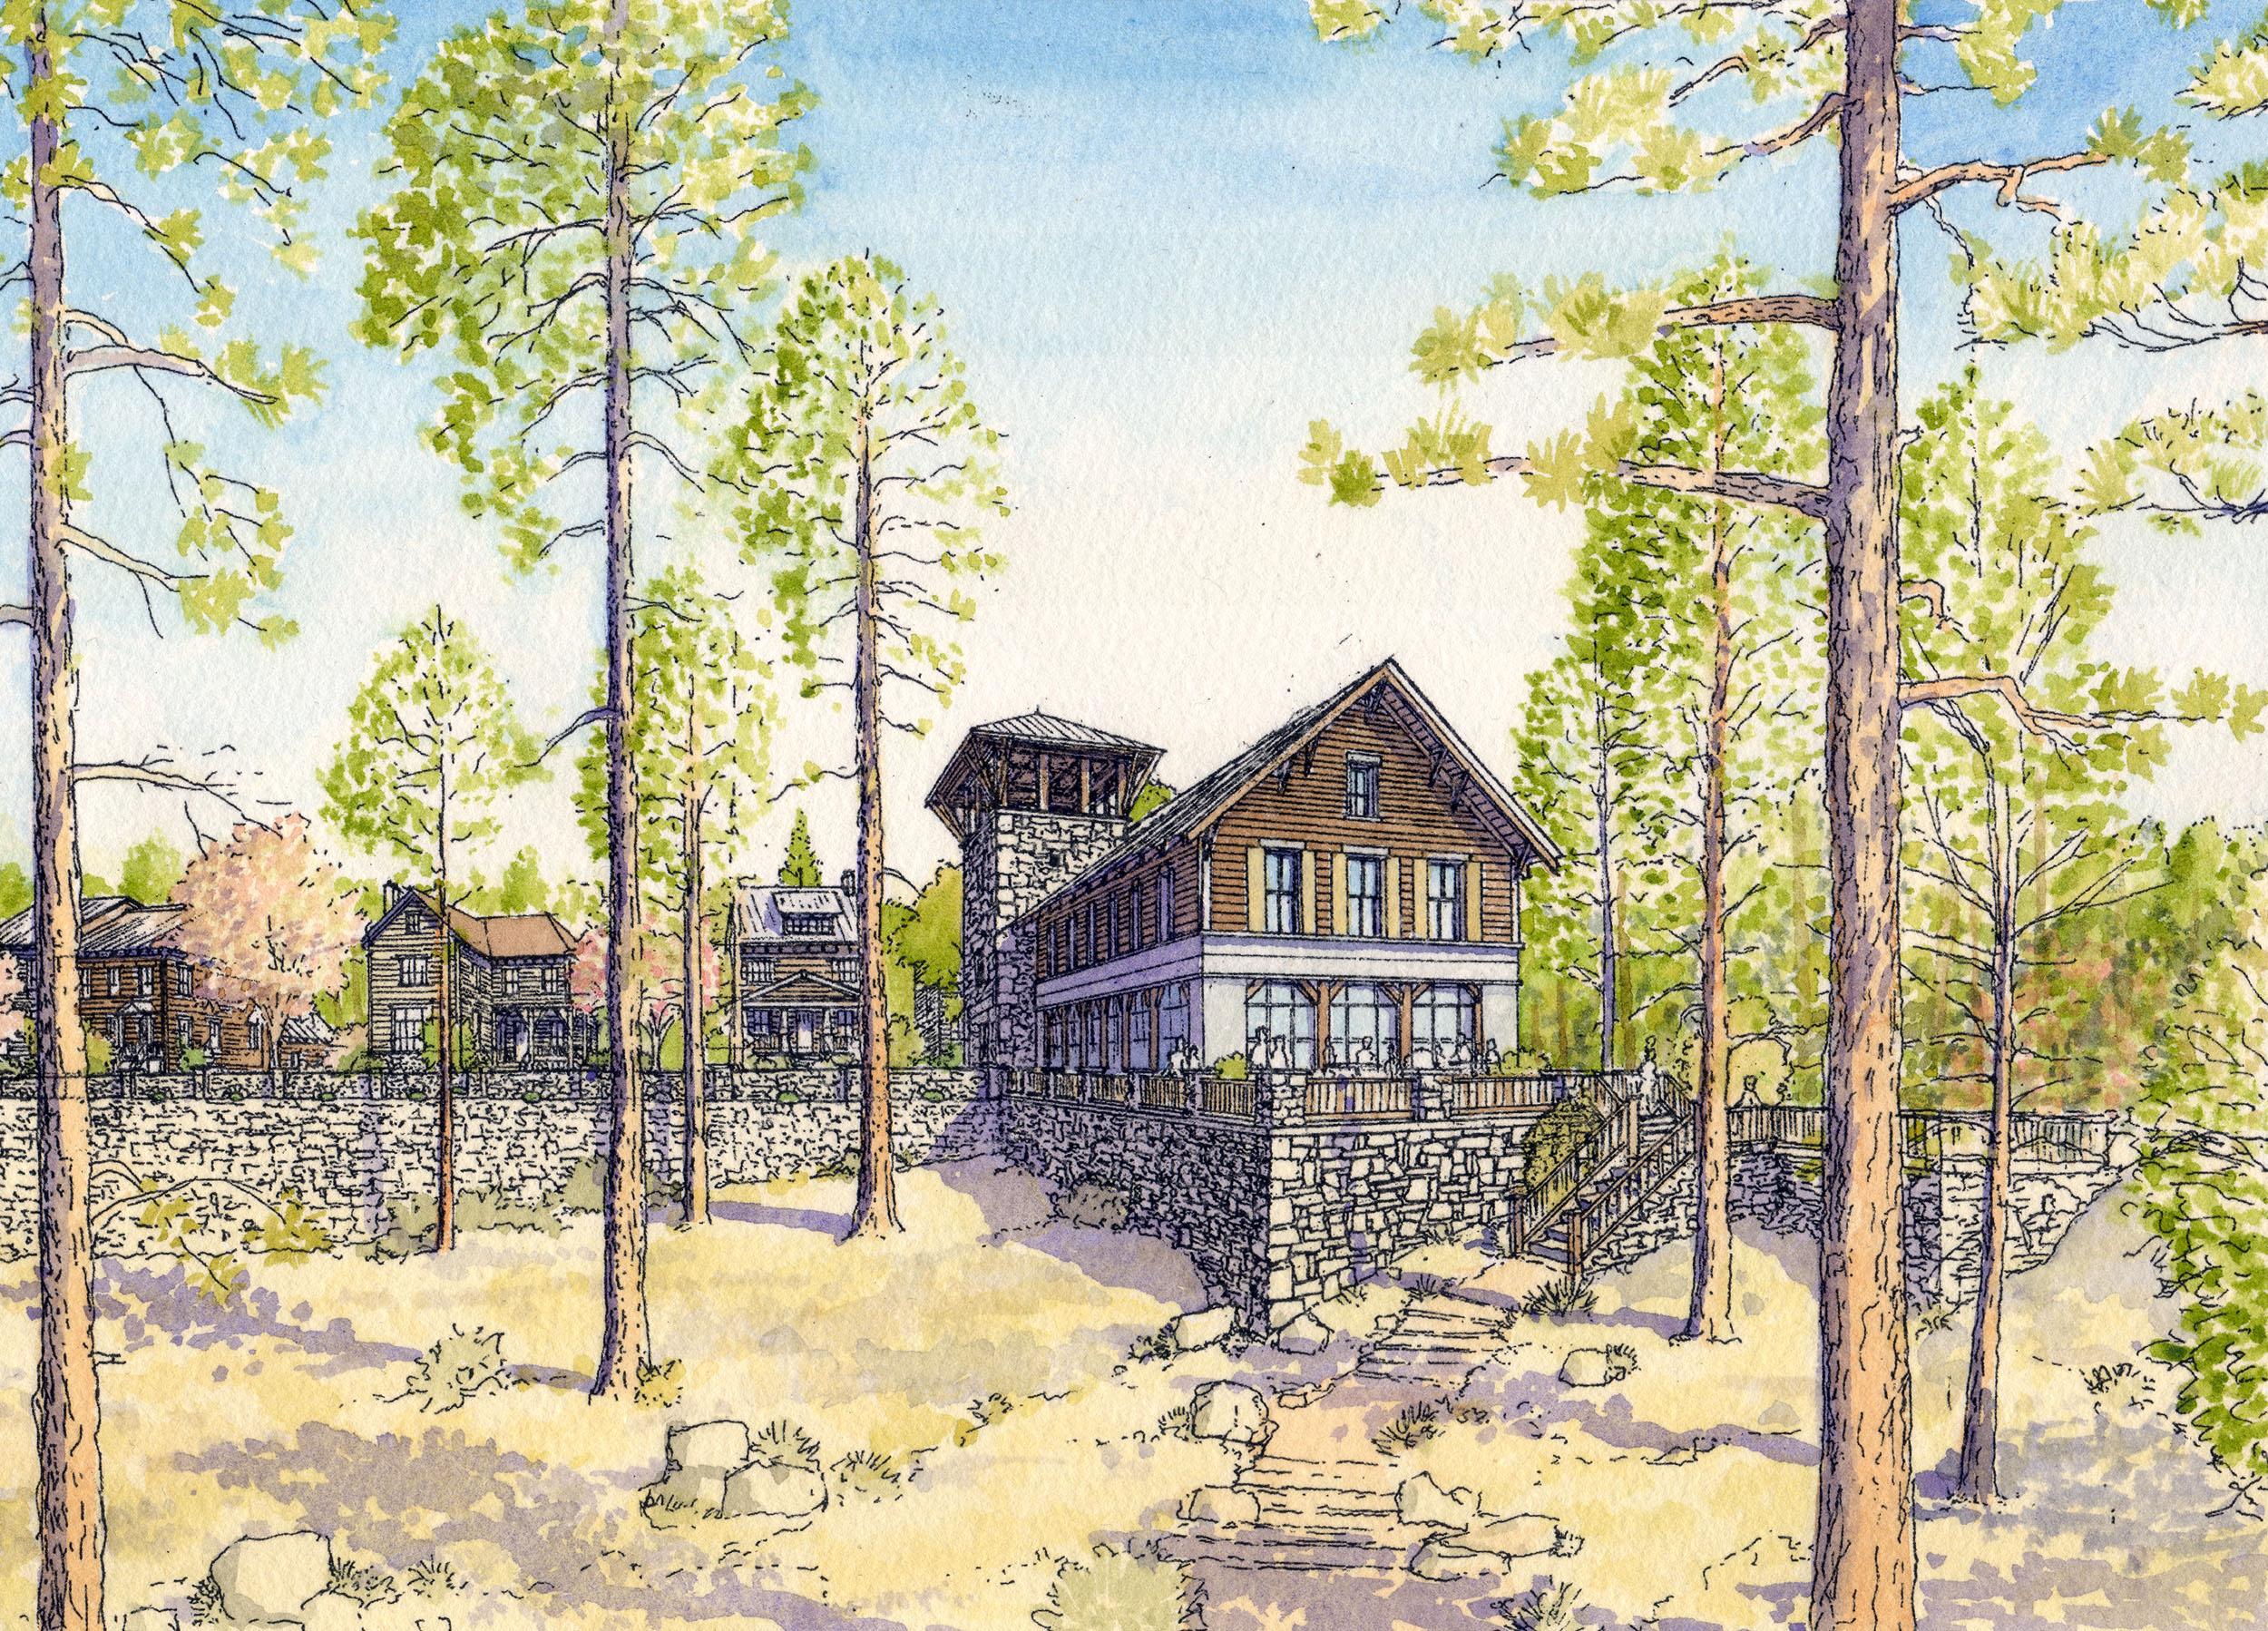 juniper point lodge & trail head colored hi res.jpg